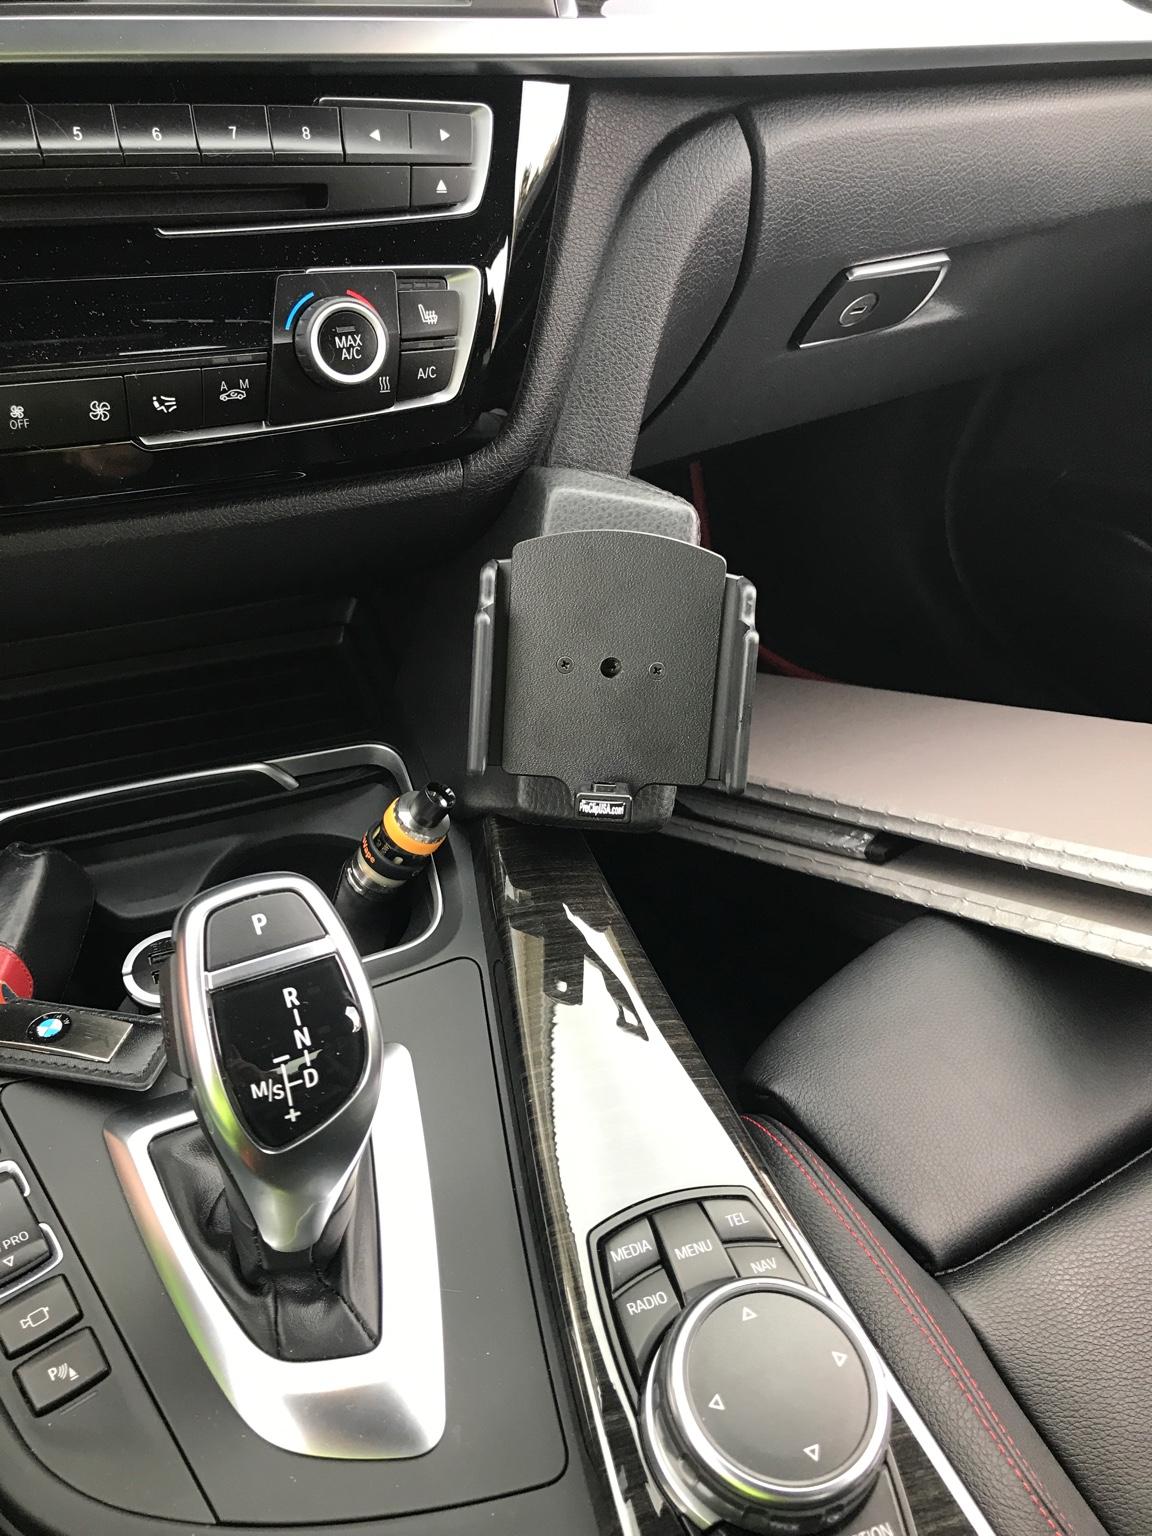 cheap for discount 7e19b 0b7fe BMW F30 IPhone 7 Plus Mount - Bimmerfest - BMW Forums